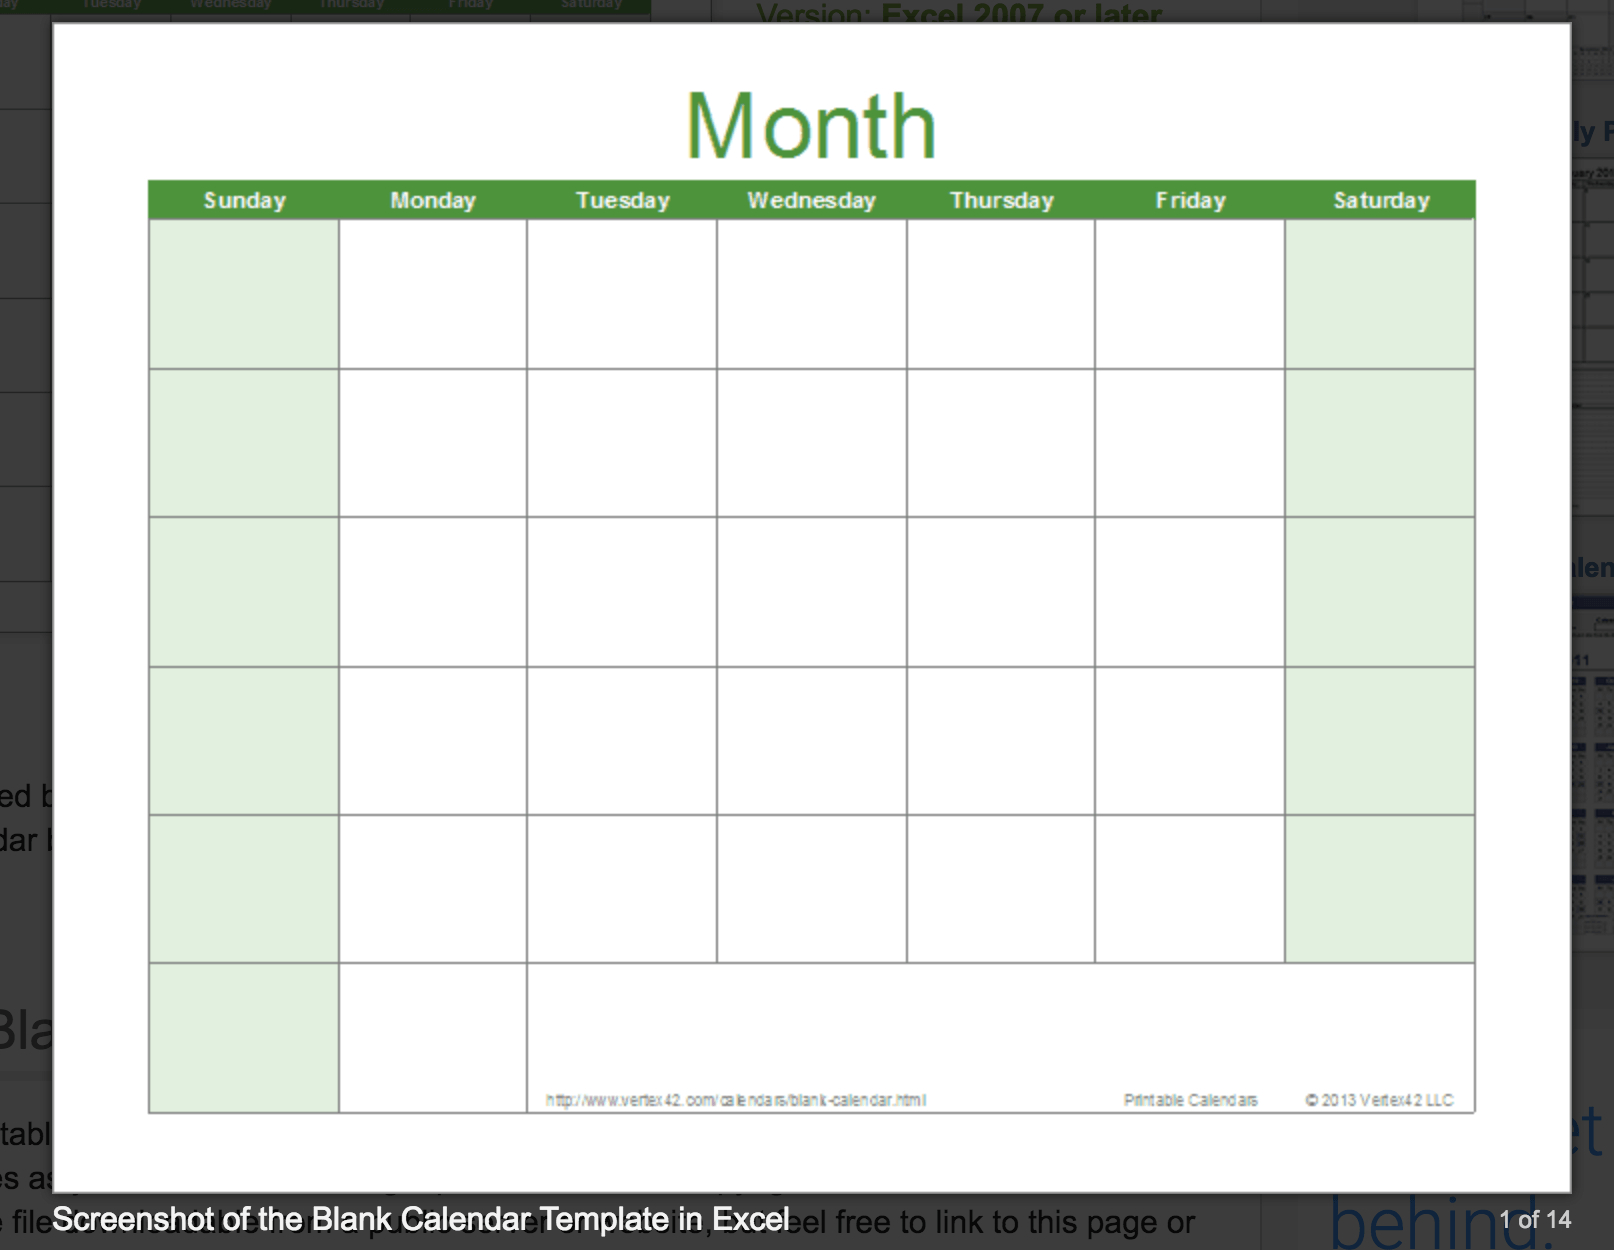 Free Printable Blank Calendar 2020 Blank Calendar I Can Edit And Print